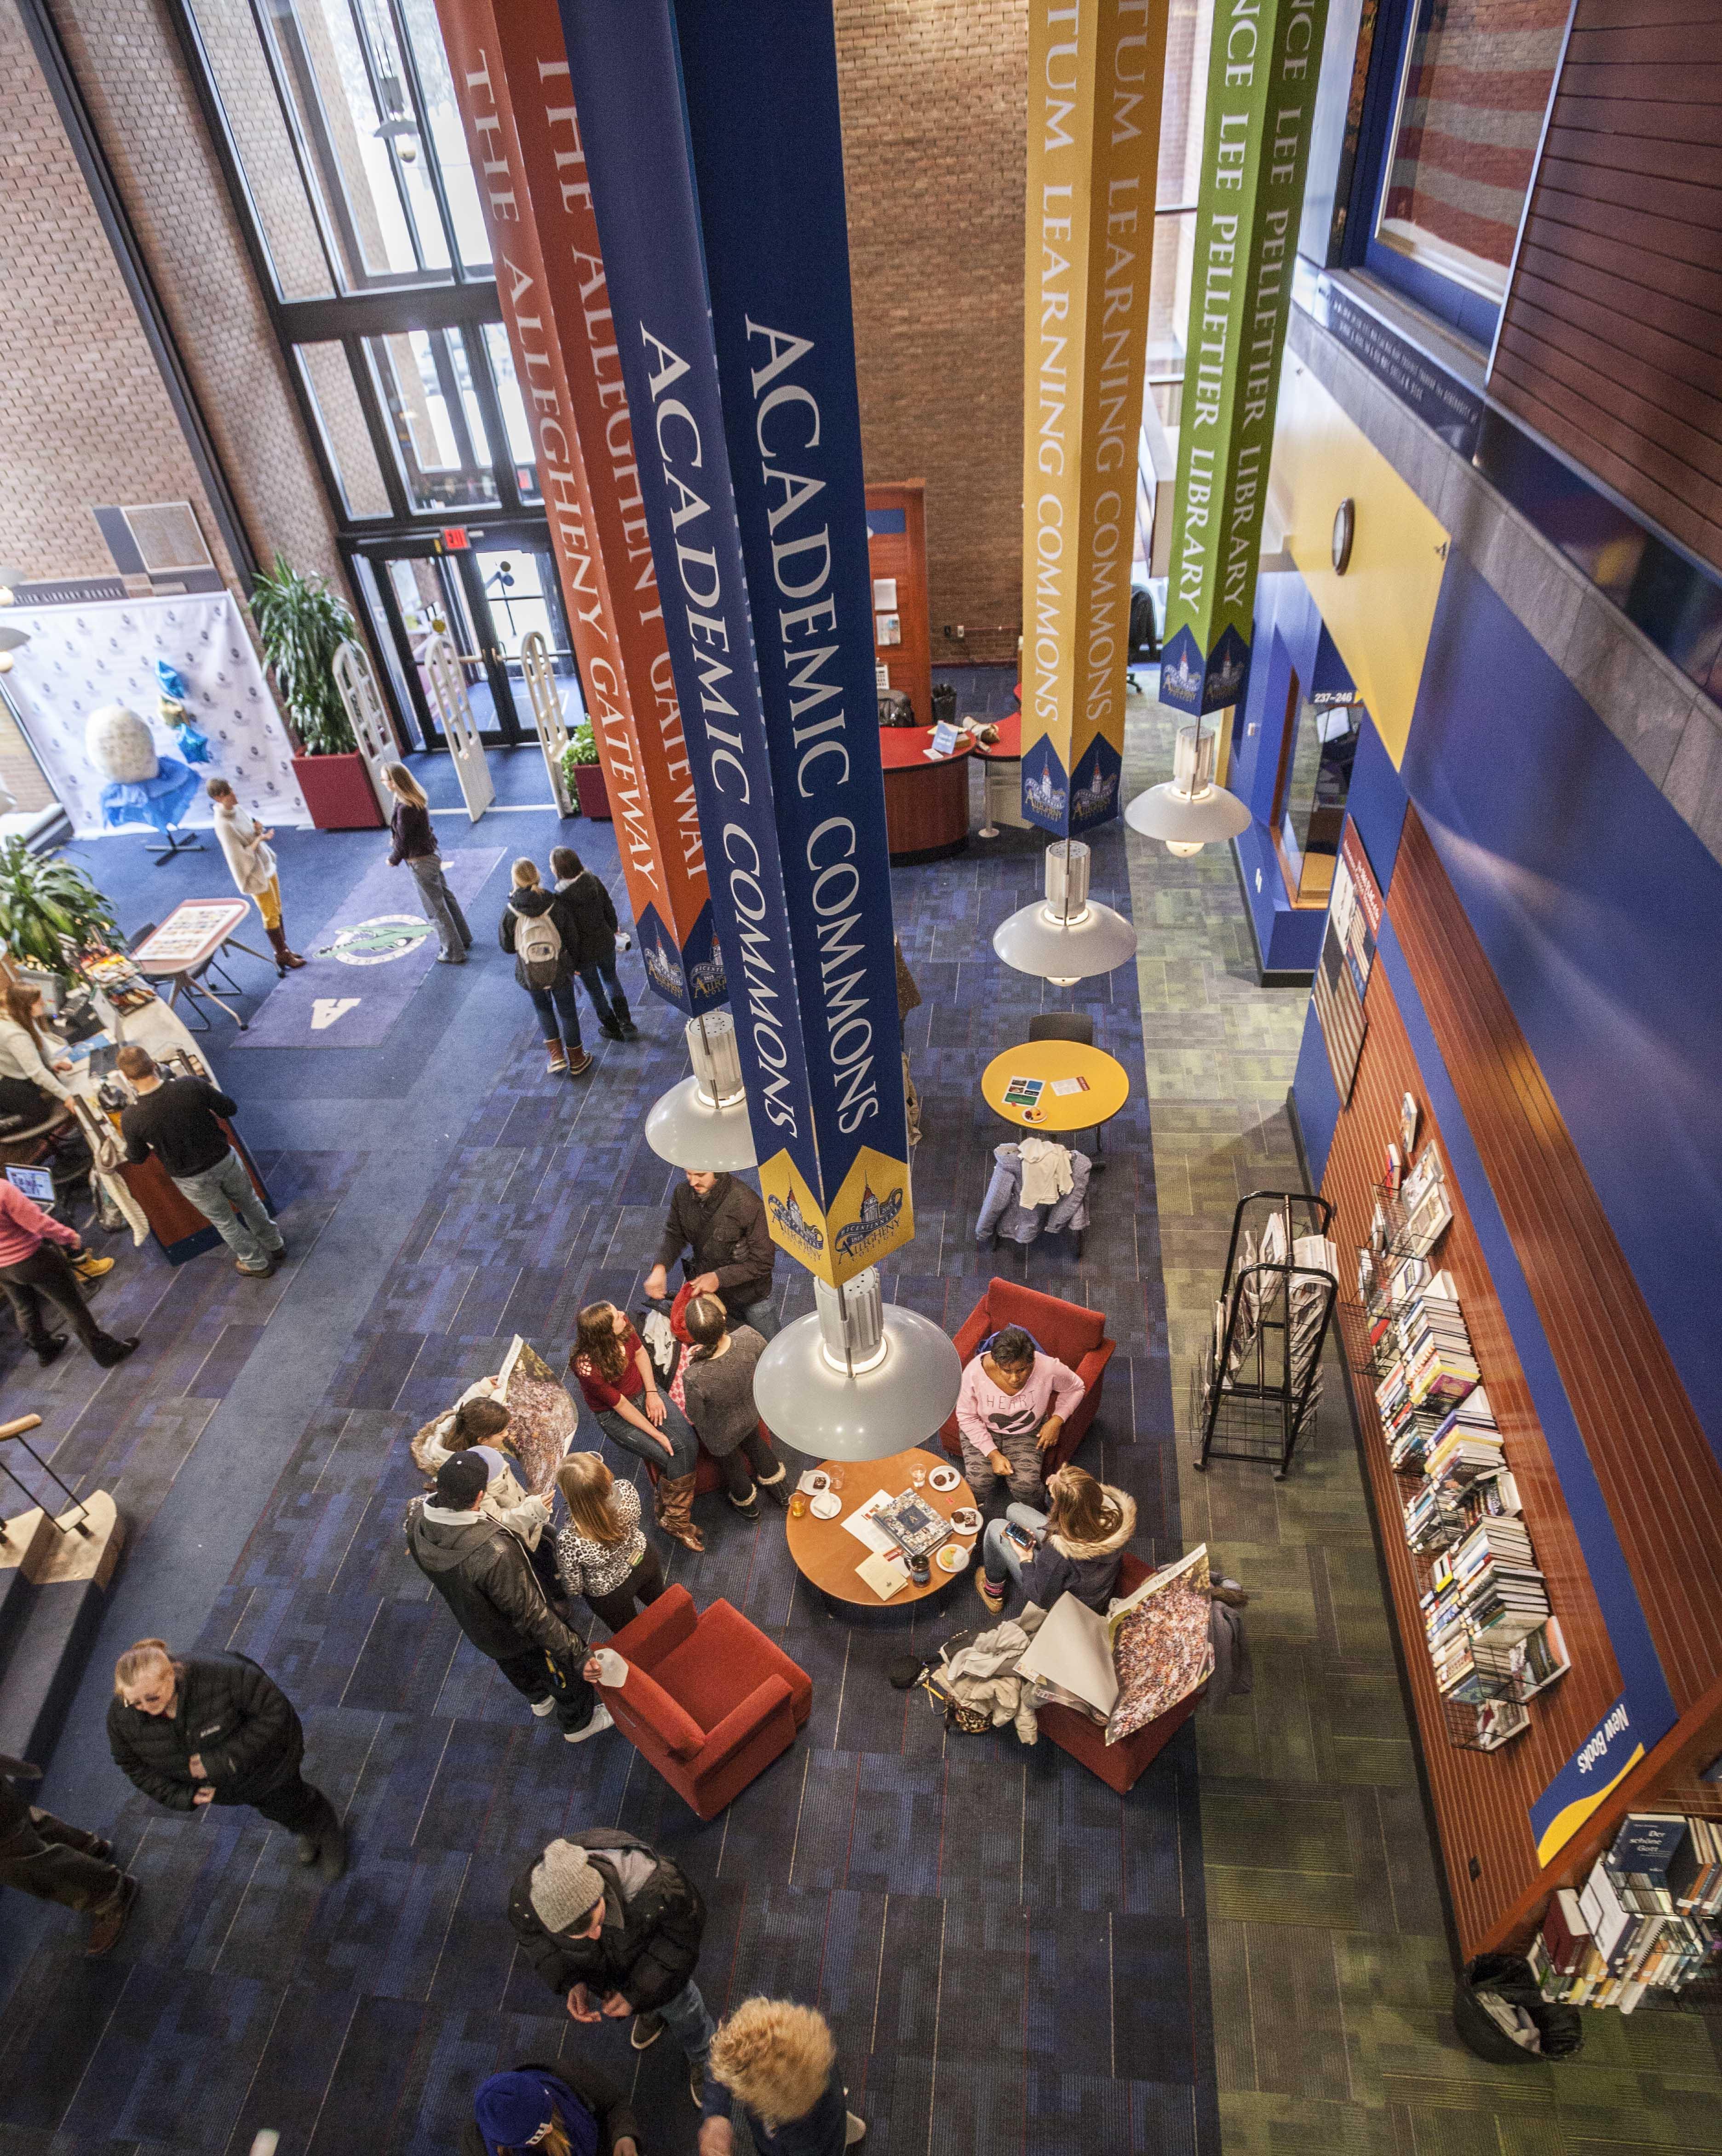 89 Us News Top Interior Design Schools Brandeis University Overall Rankings View All 25